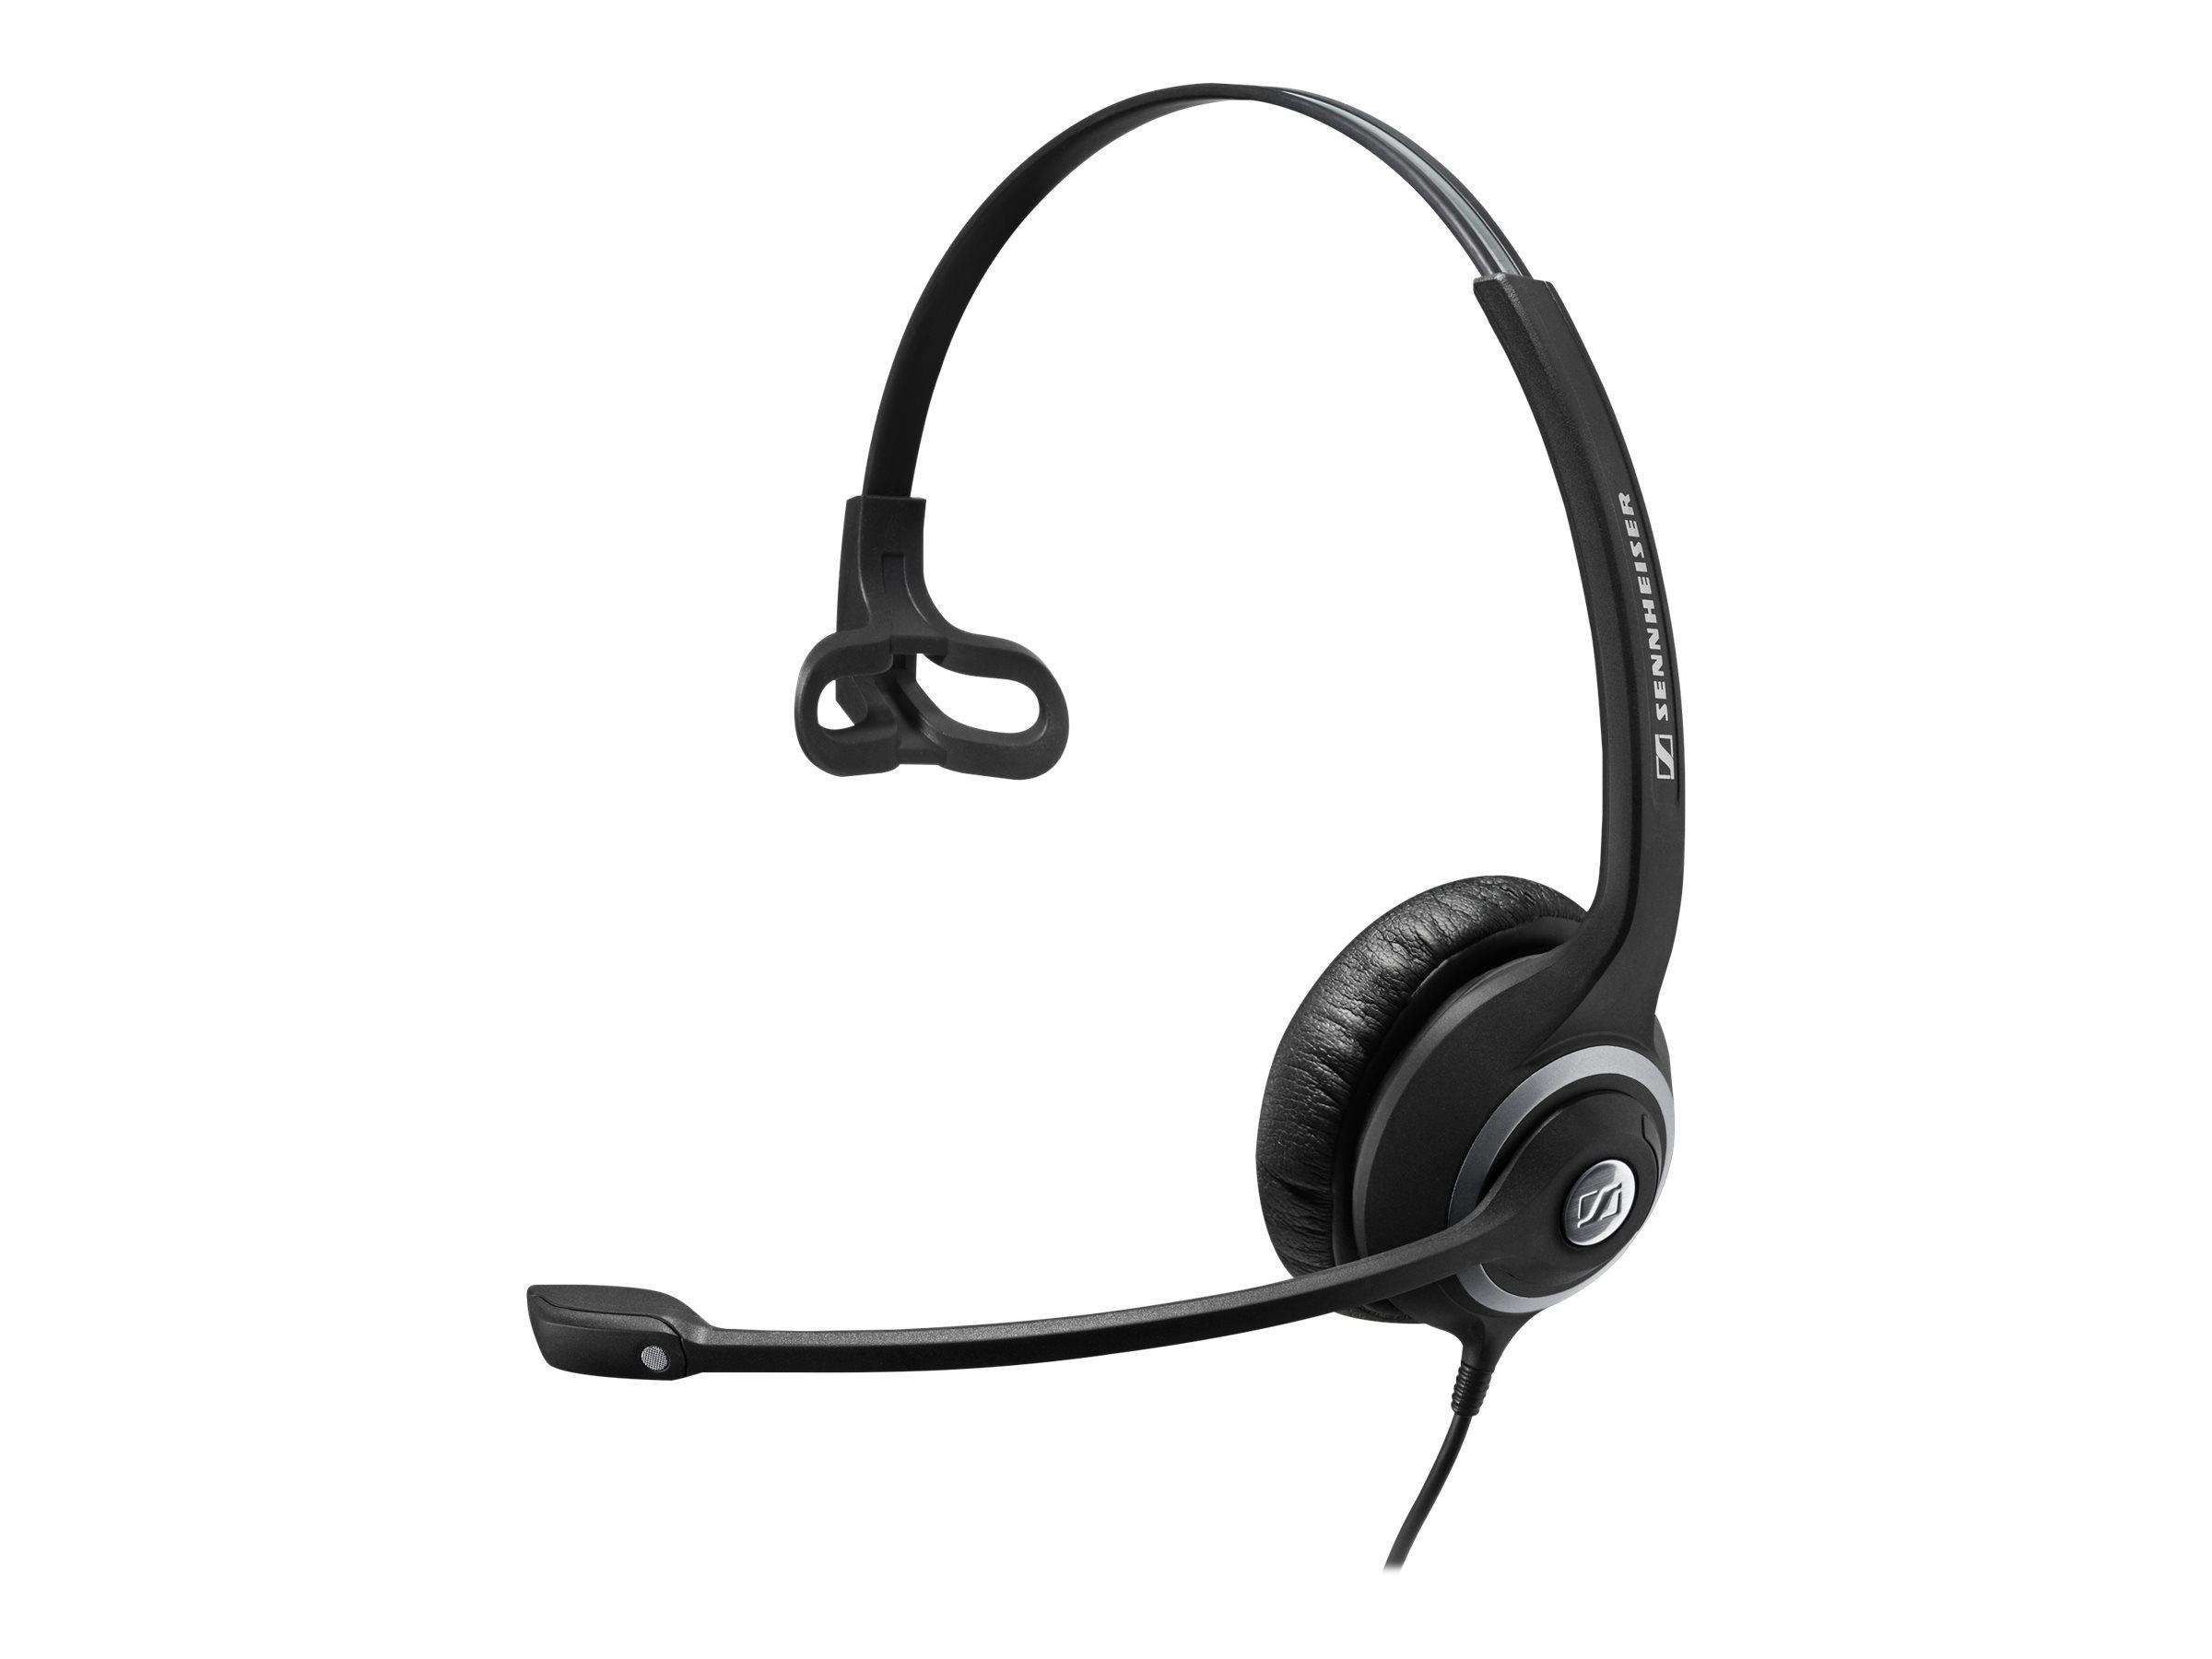 Sennheiser Circle SC 230 MS II - Headset - On-Ear - kabelgebunden - aktive Rauschunterdrückung - Schwarz